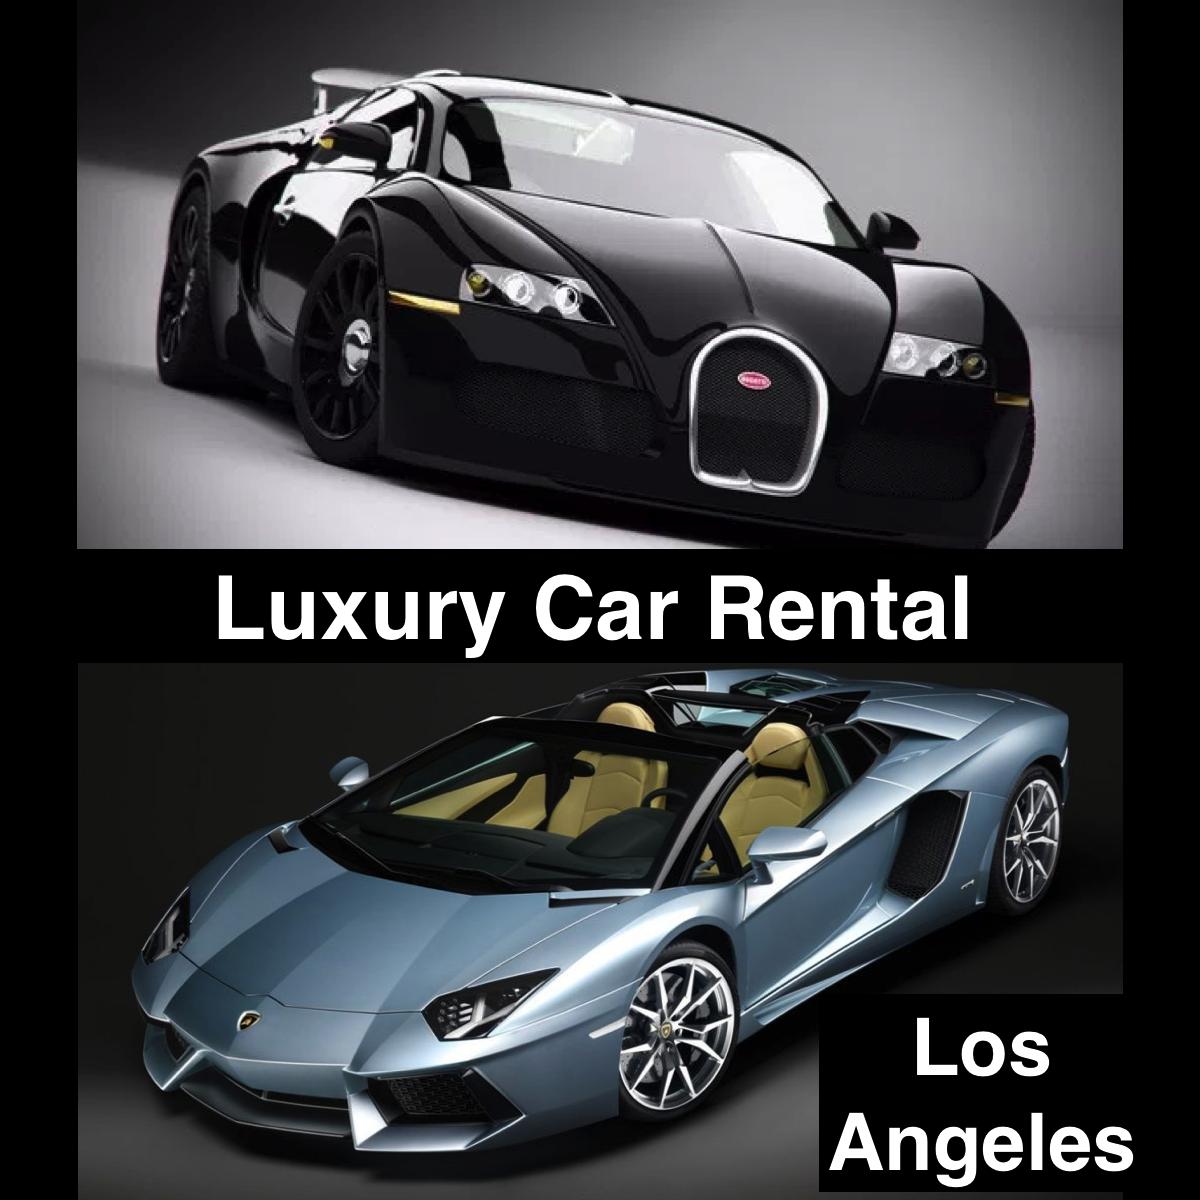 Luxury Car Rental Los Angeles Exotic Cars All Best Top 10 Reviews